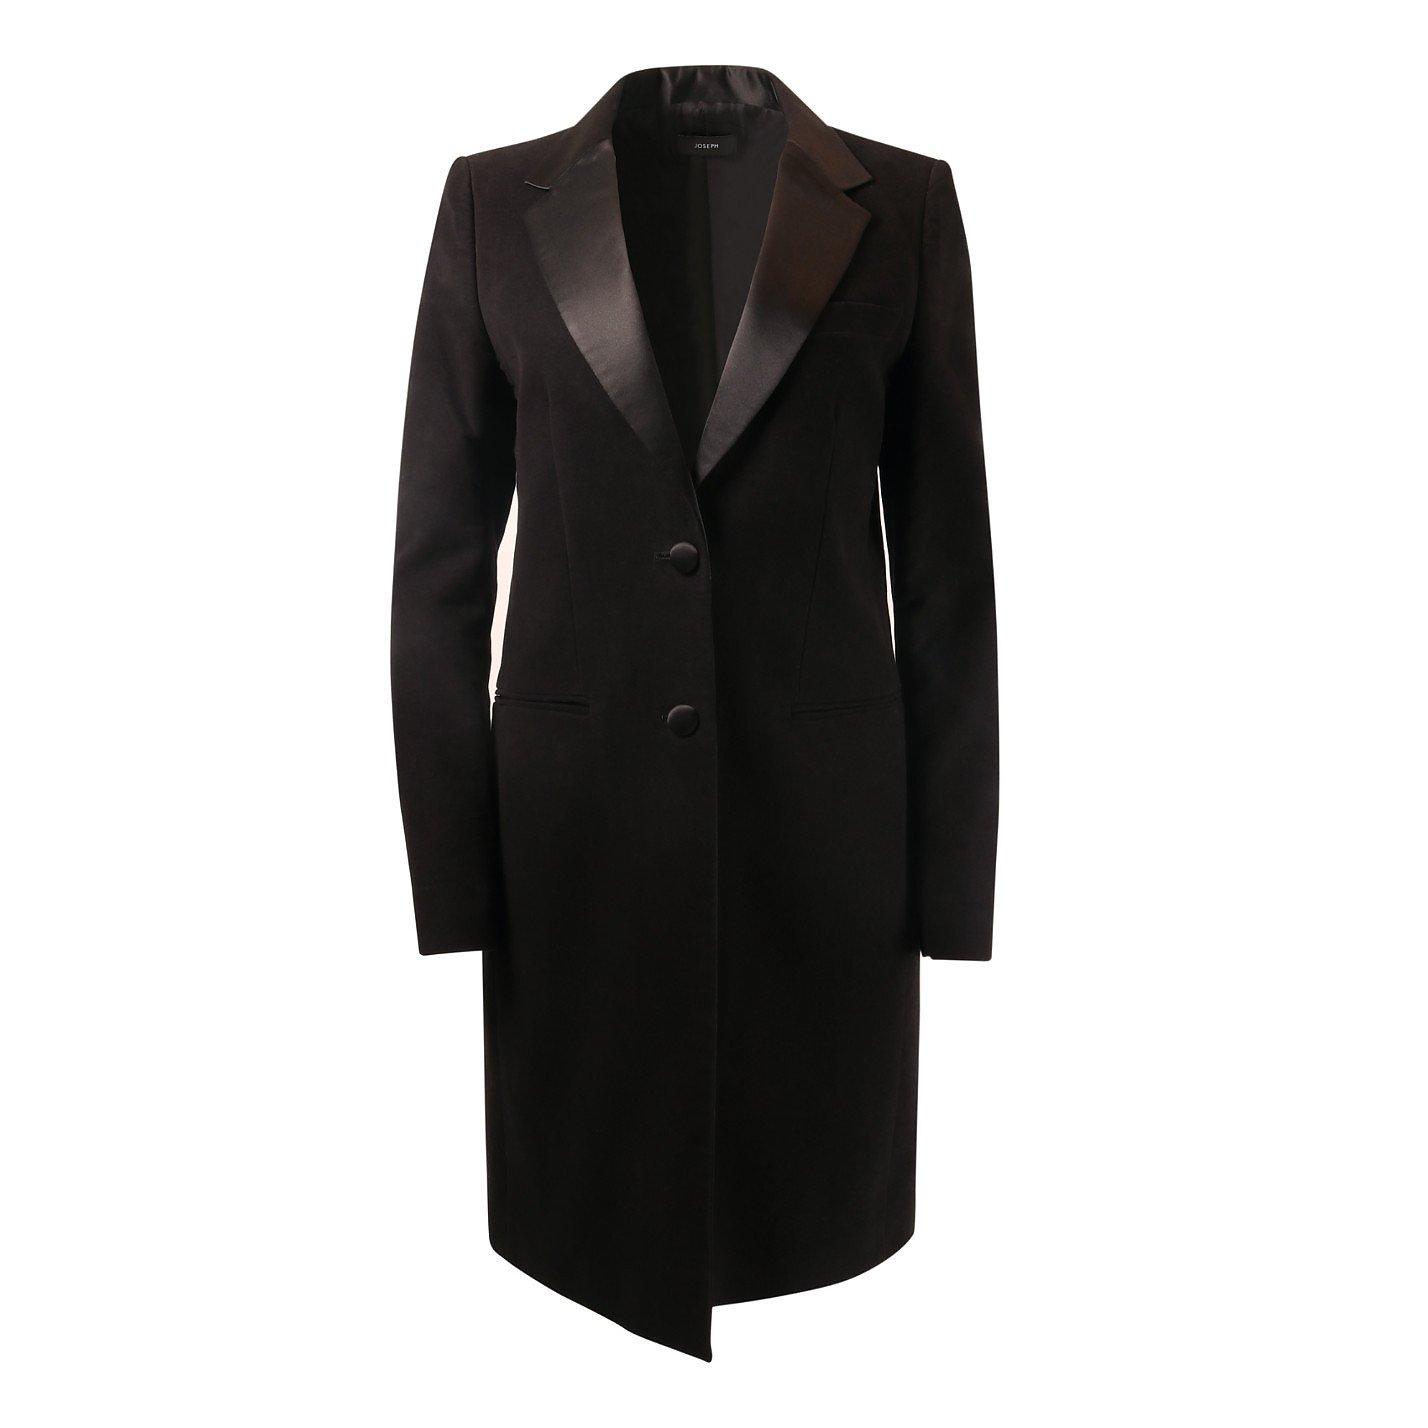 Joseph Satin-Trimmed Coat